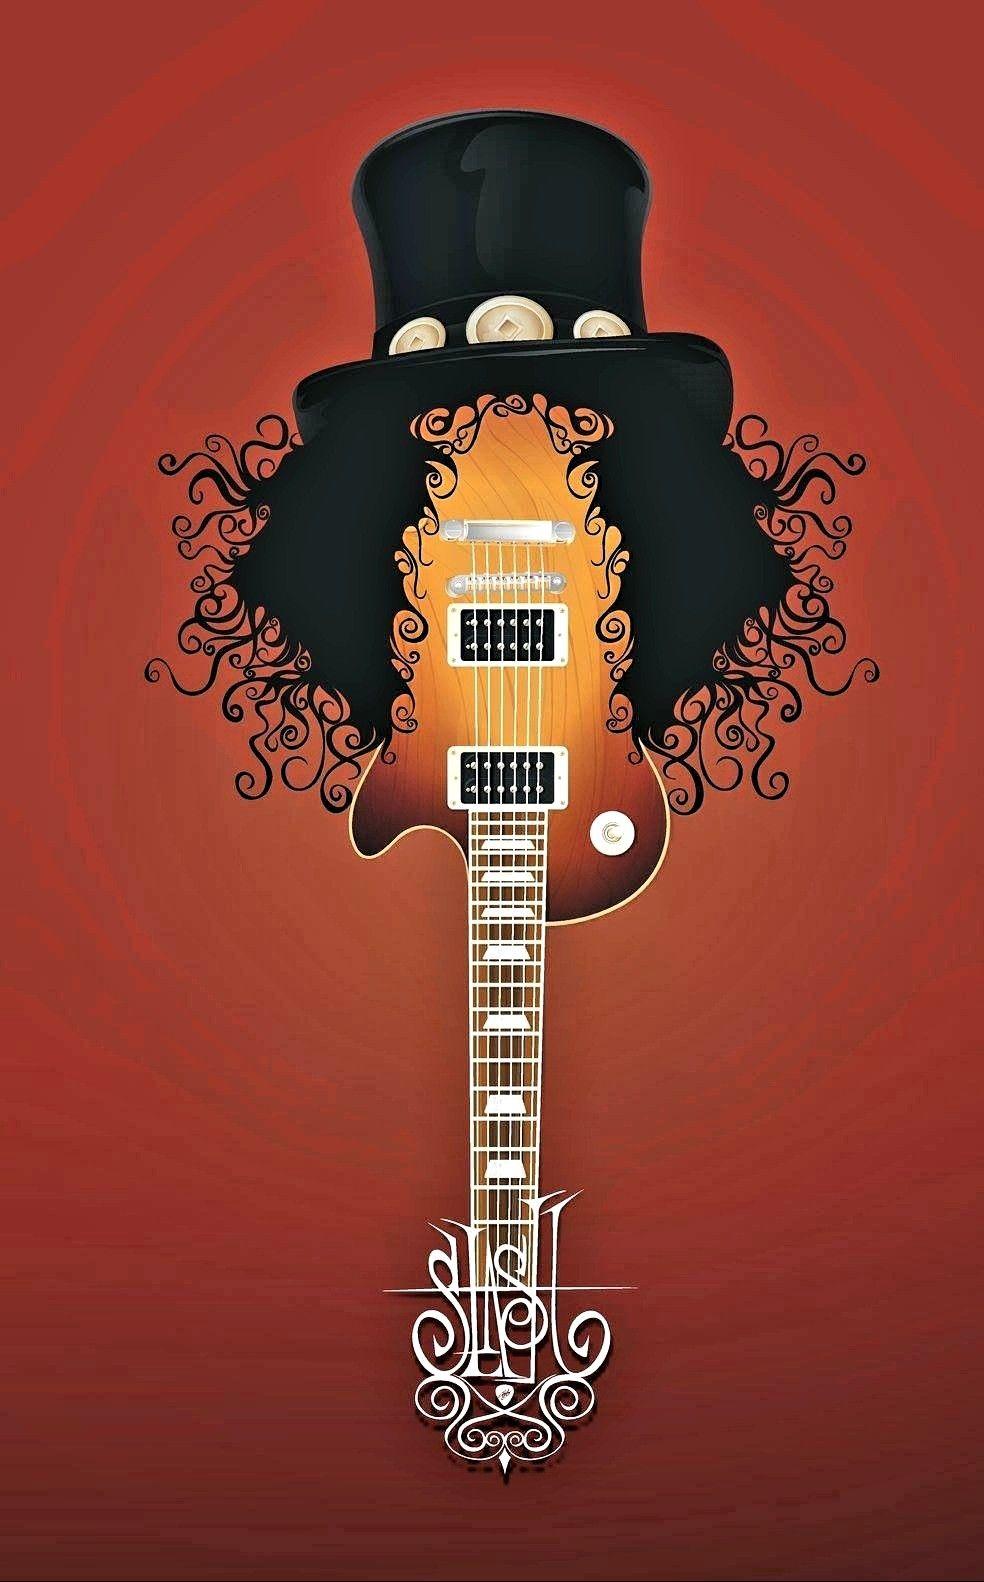 83655767dc Pin by Joseph Wain on Rock-N-Roll Art | Rock posters, Rock, Music bands